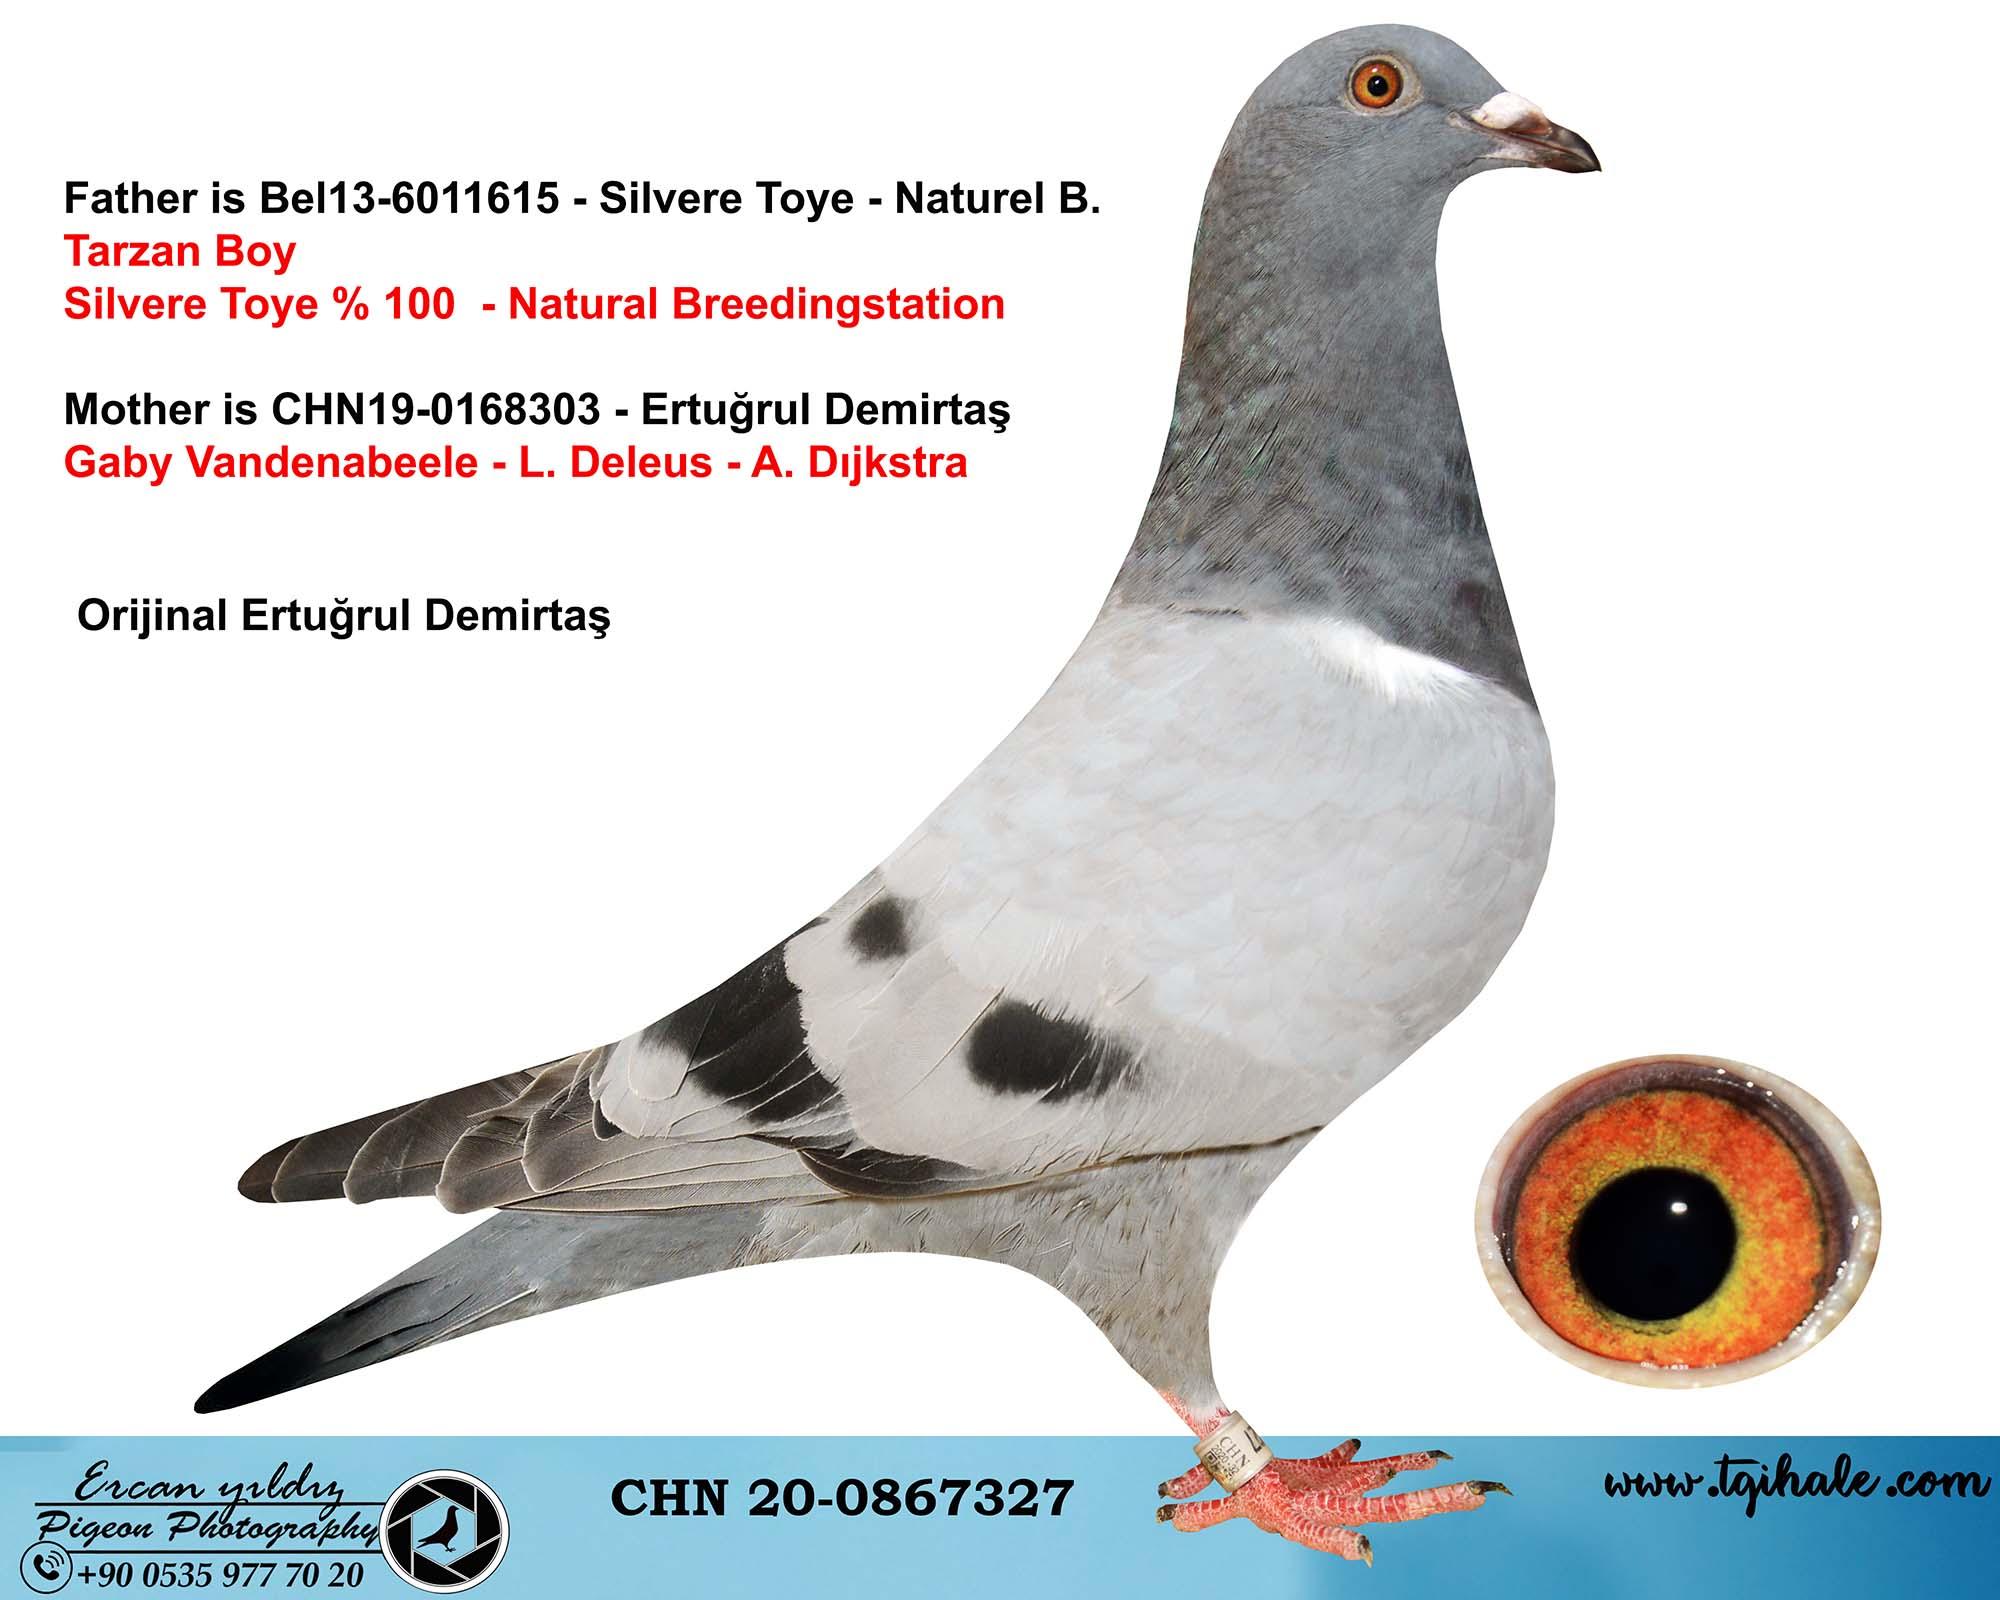 CHN20-0867327 DİŞİ / SİLVERE TOYE - GABY VANDENABEELE - A.DIJSTRA